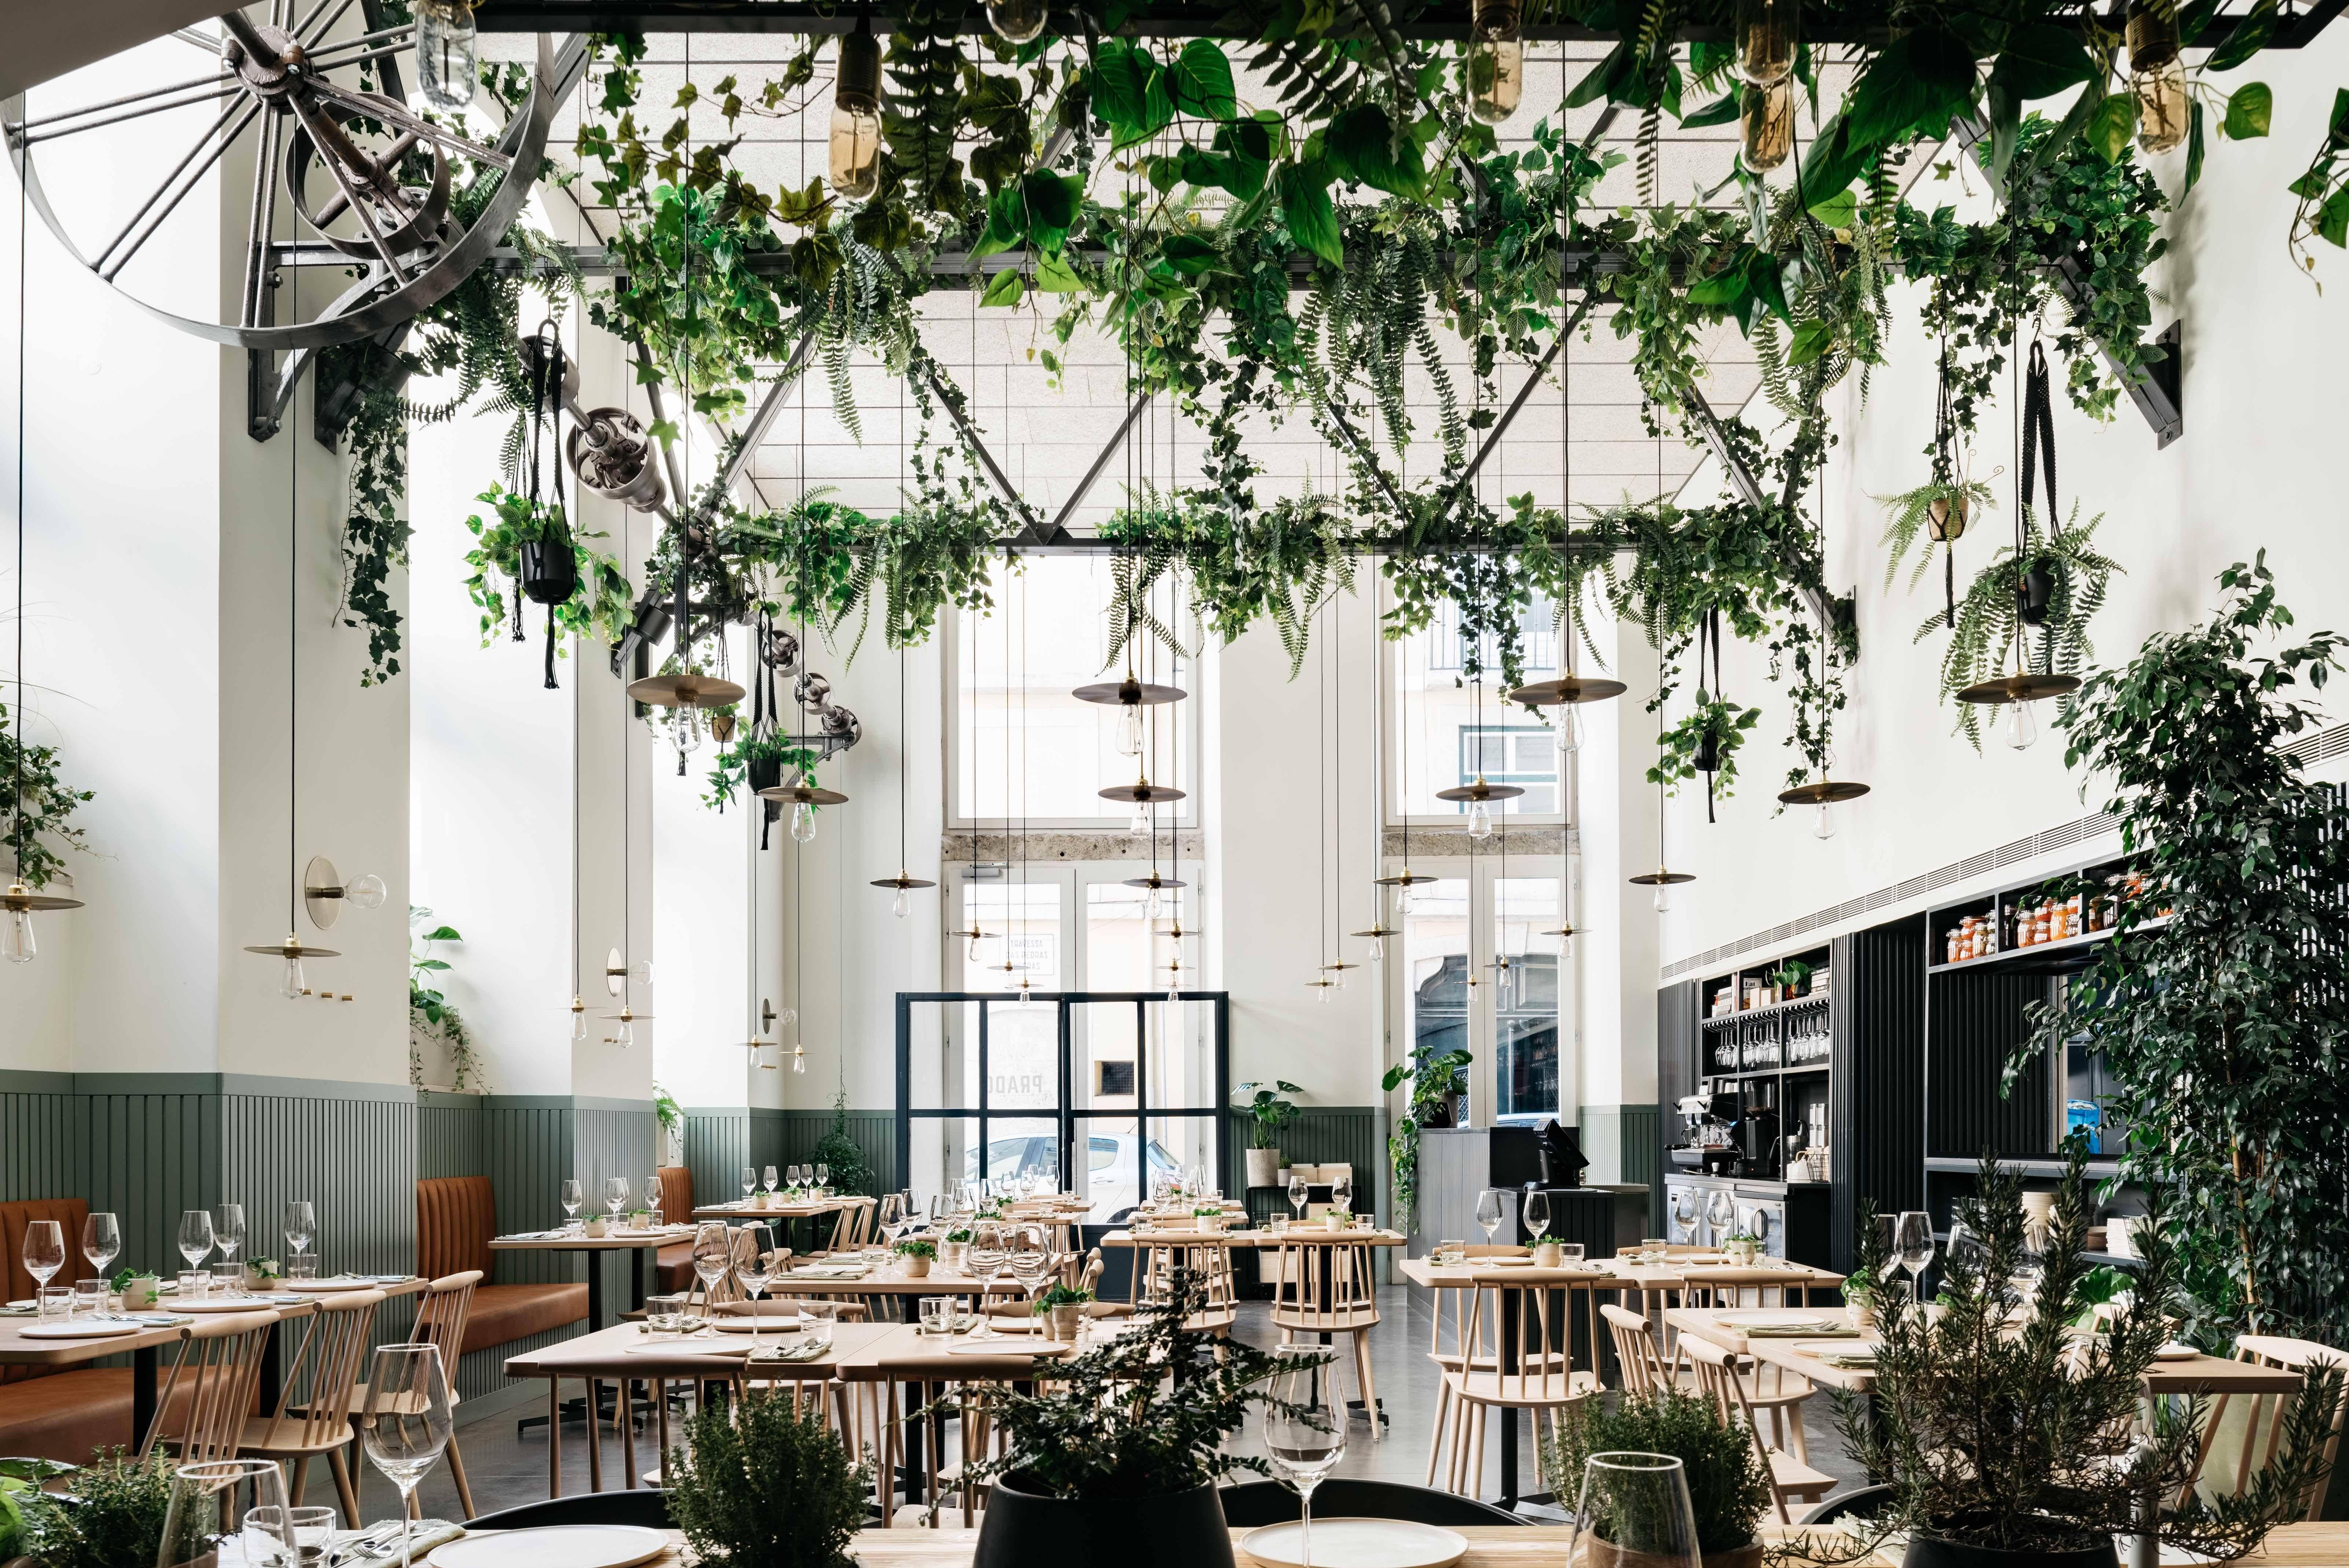 Prado Stylish Nature Inspired Restaurant From Antonio Galapito